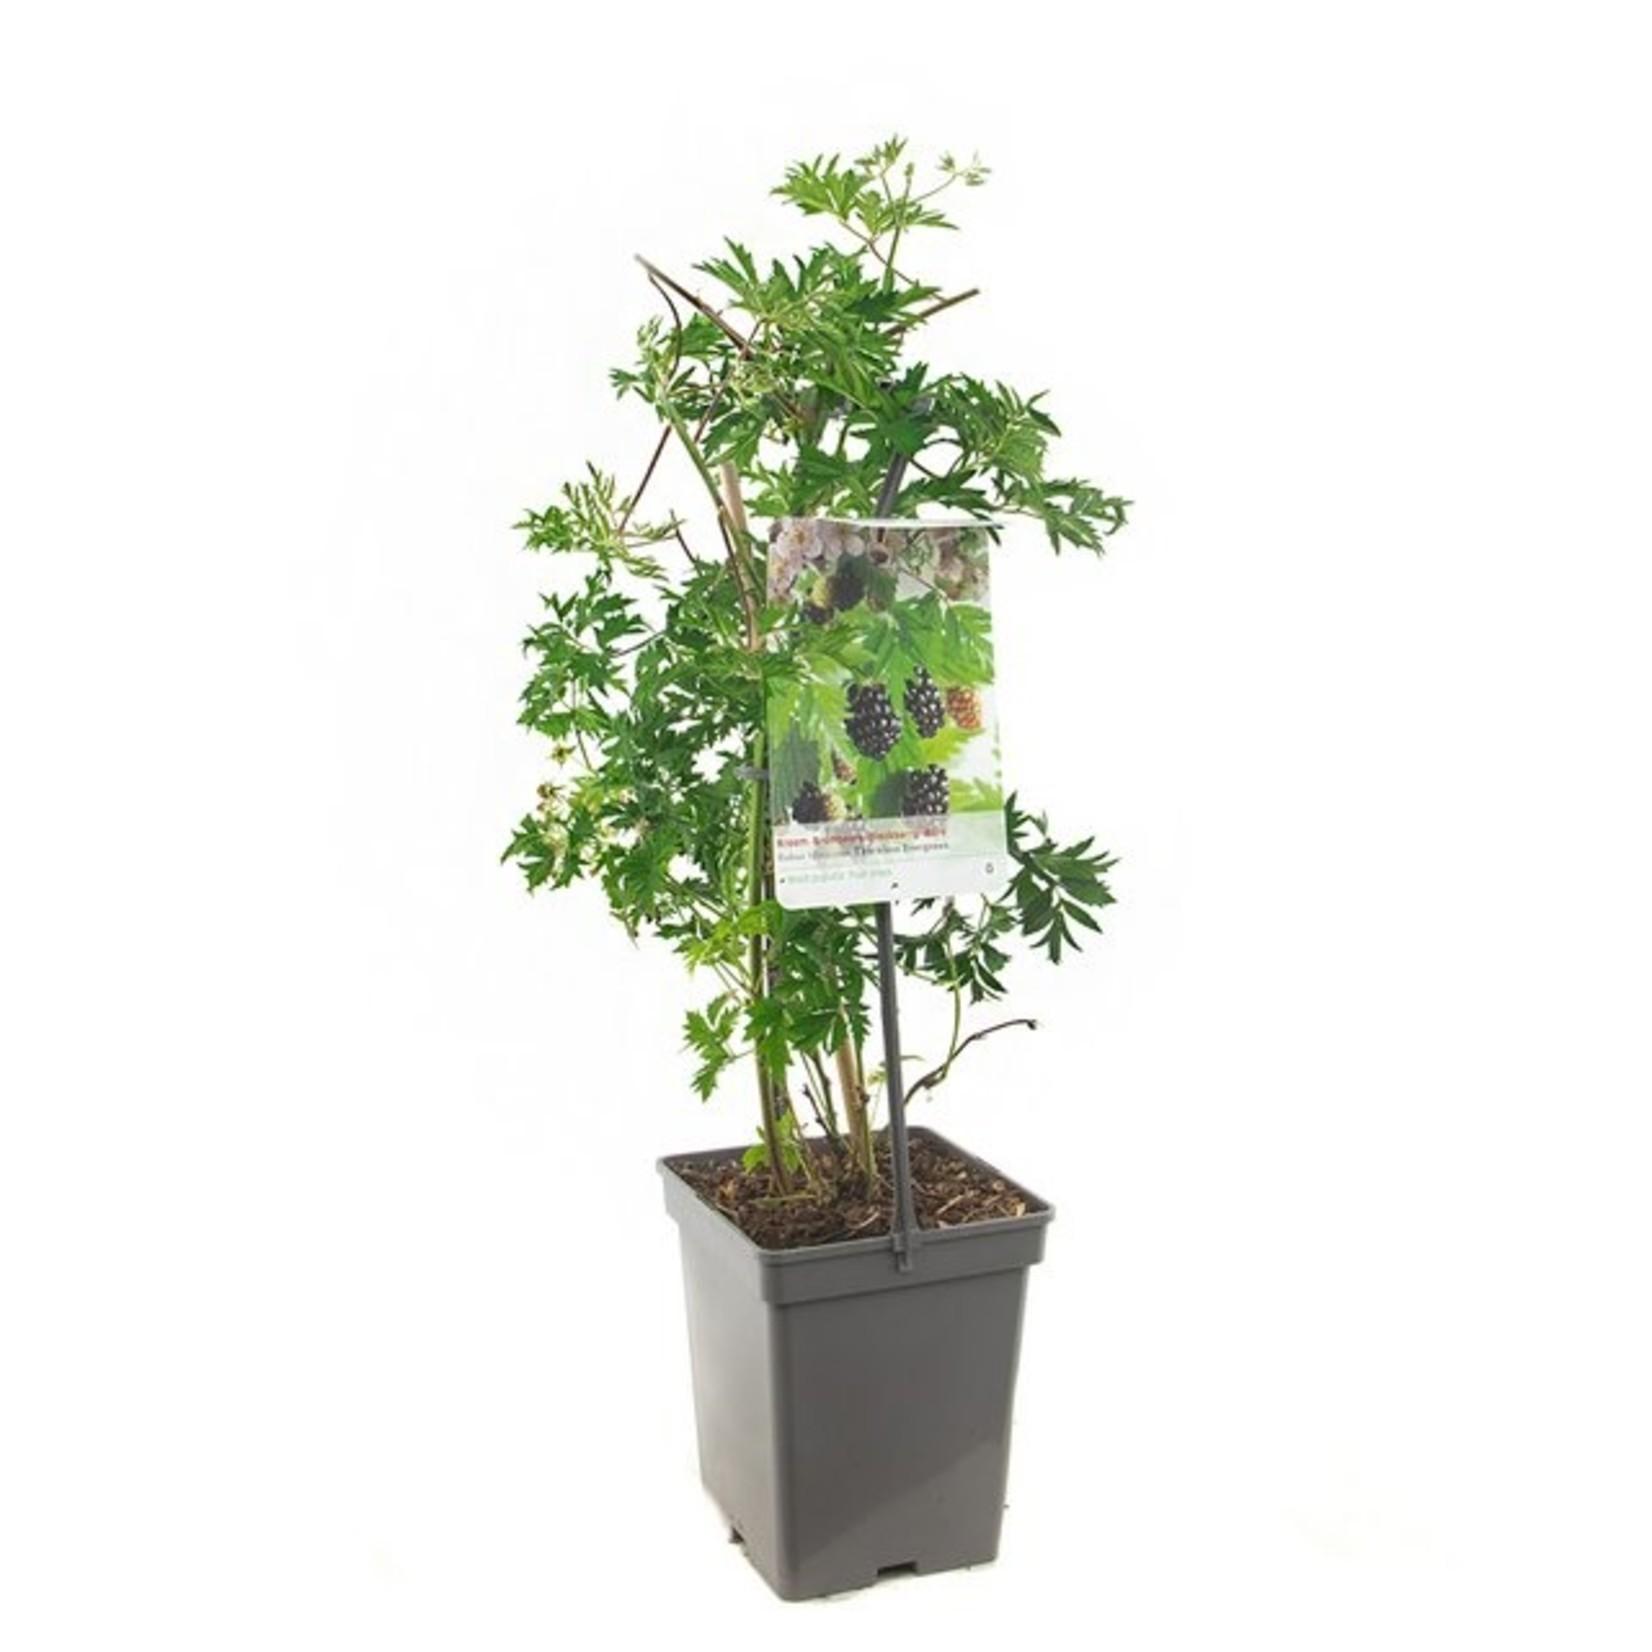 Rubus fruticosus 'Thornless Evergreen (Doornloze Braam)